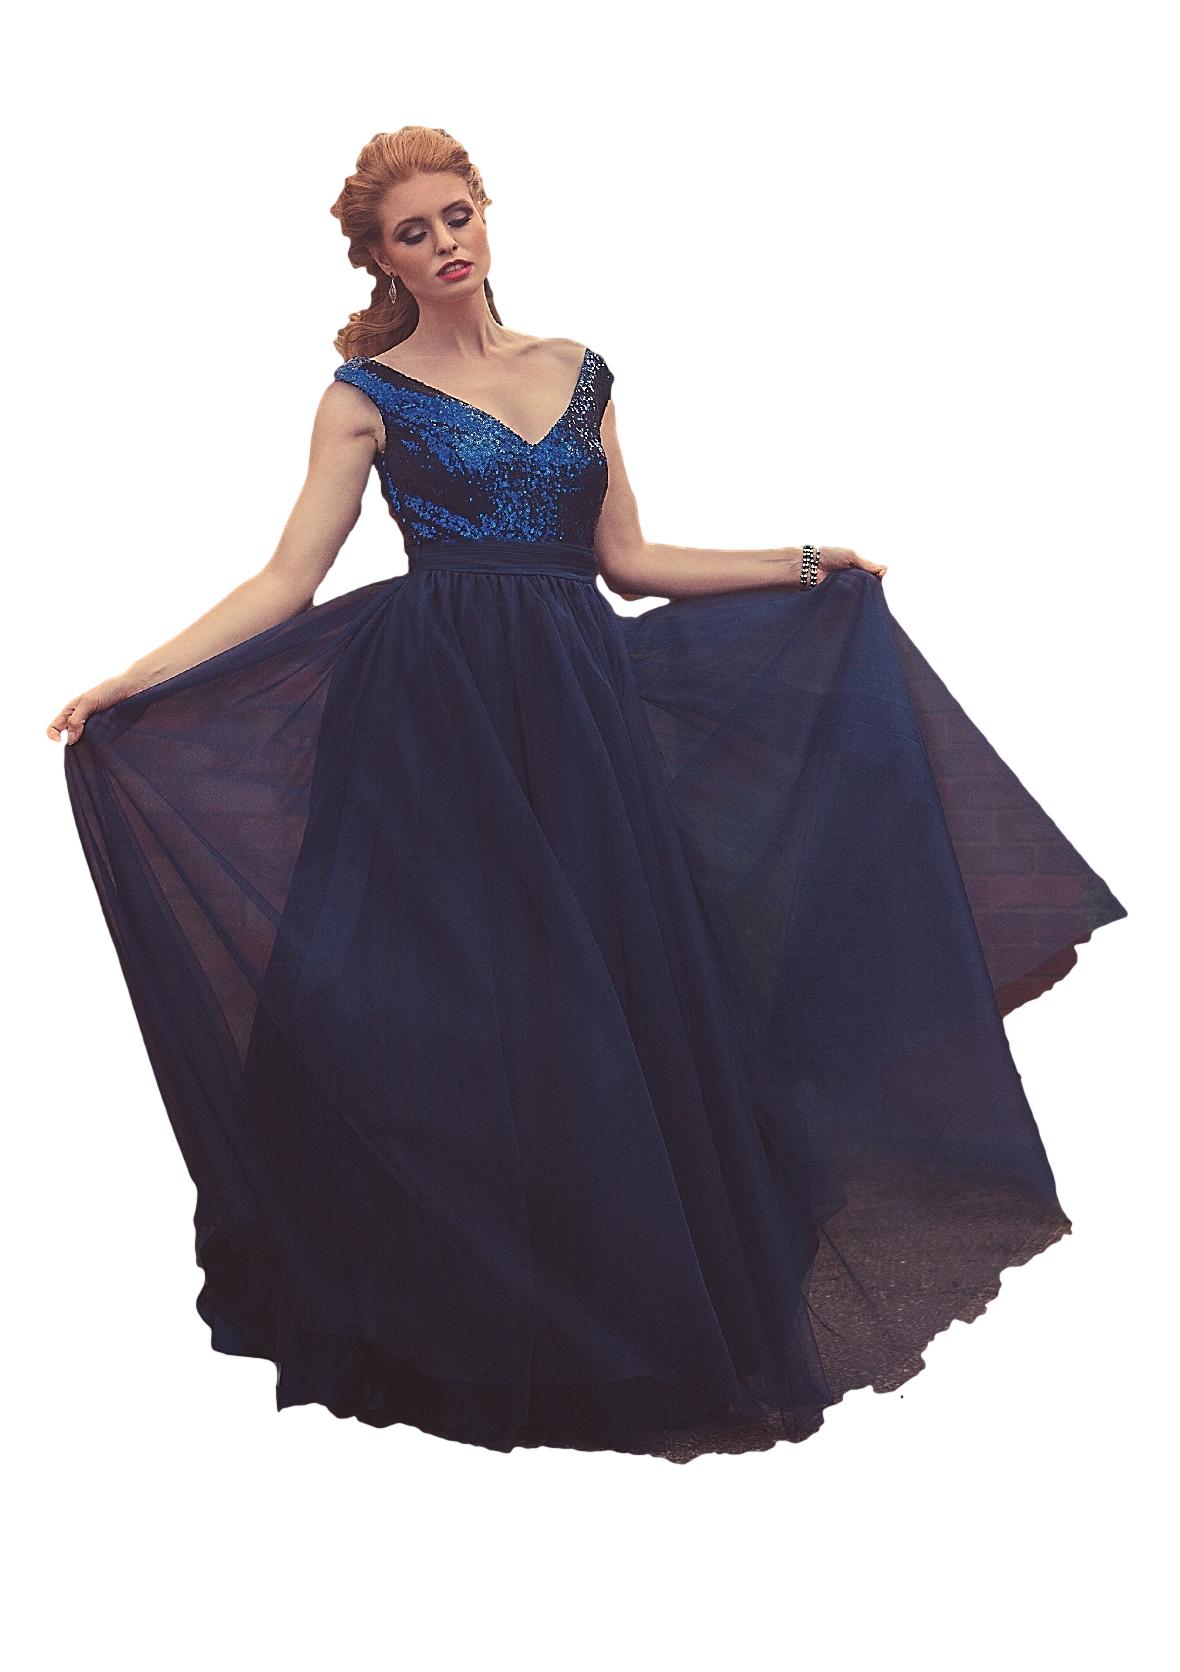 2015 Wedding Trends - Art Deco Wedding Dress Prom Dress Evening Gown Occasion Dress